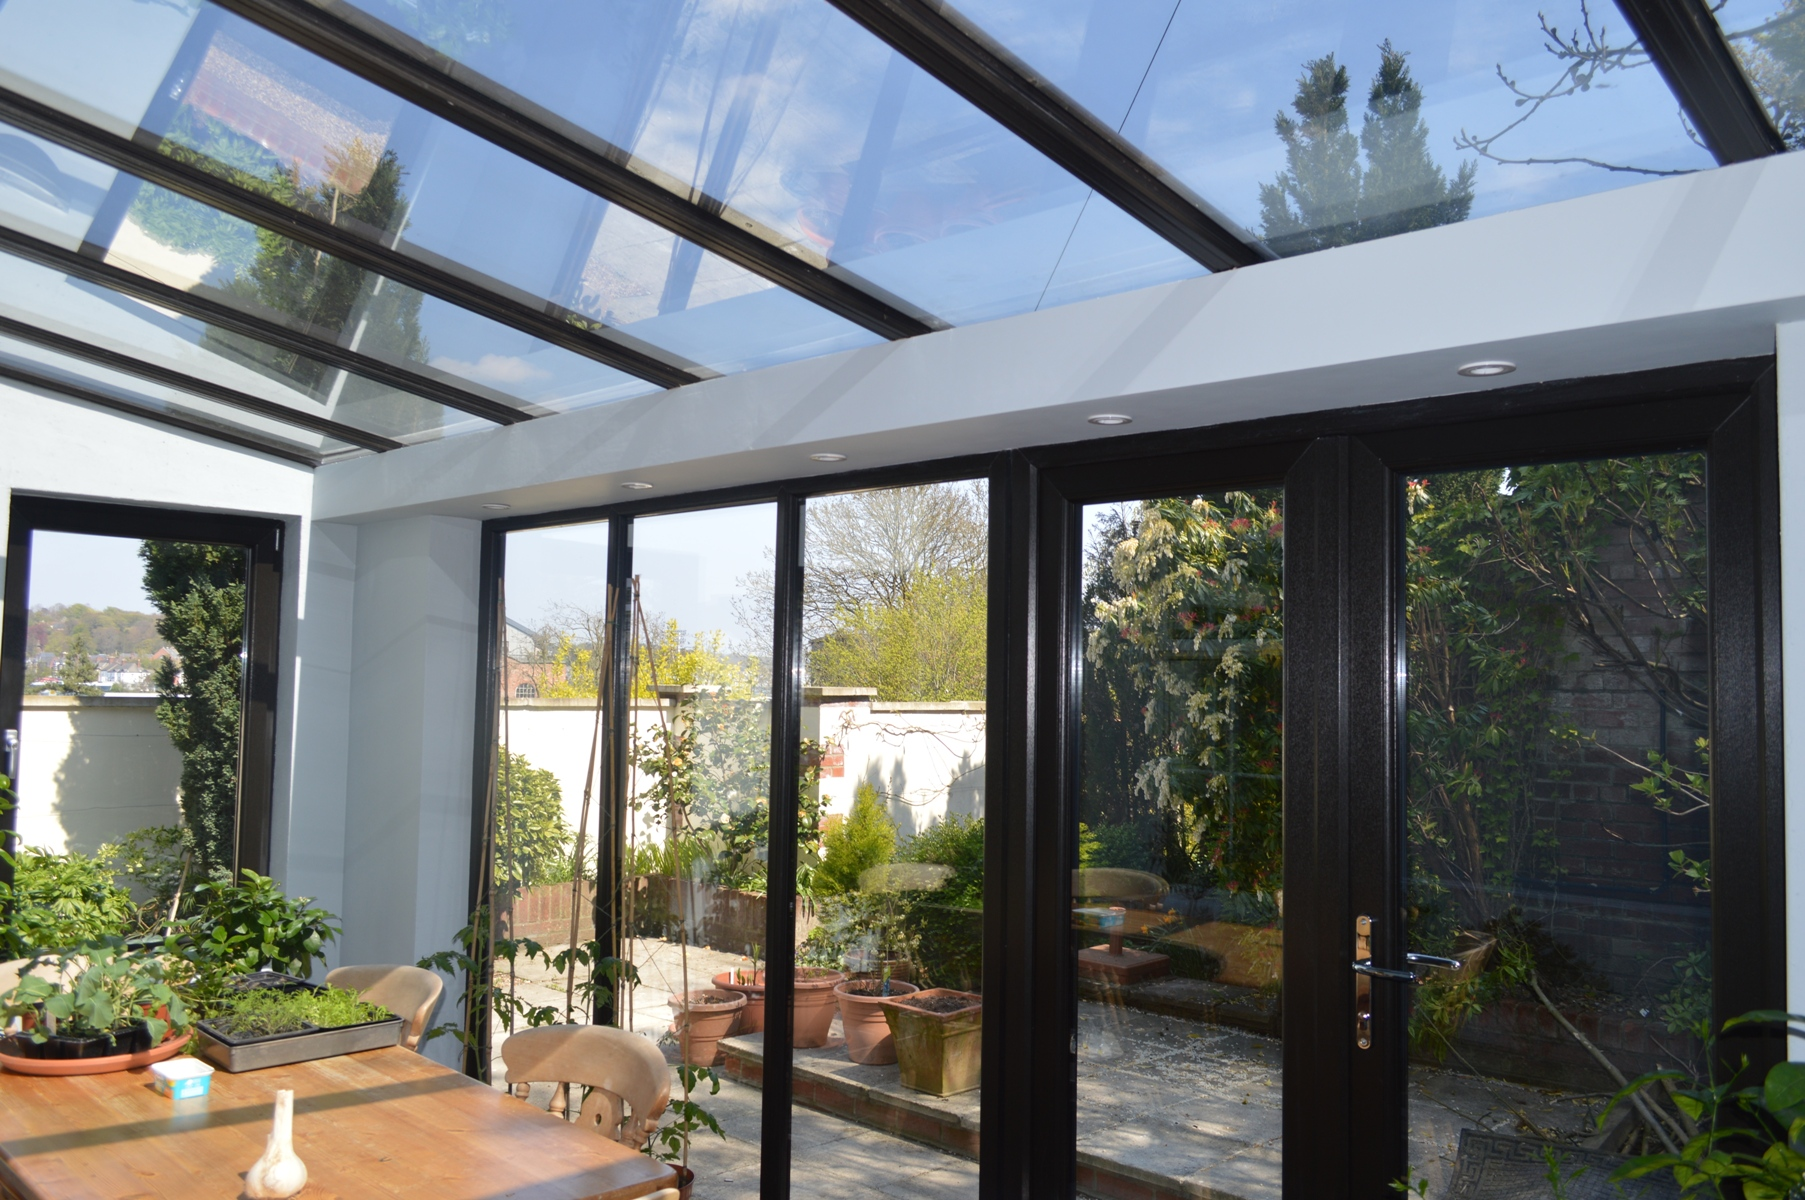 aylsham windows and conservatories norfolk photo gallery. Black Bedroom Furniture Sets. Home Design Ideas